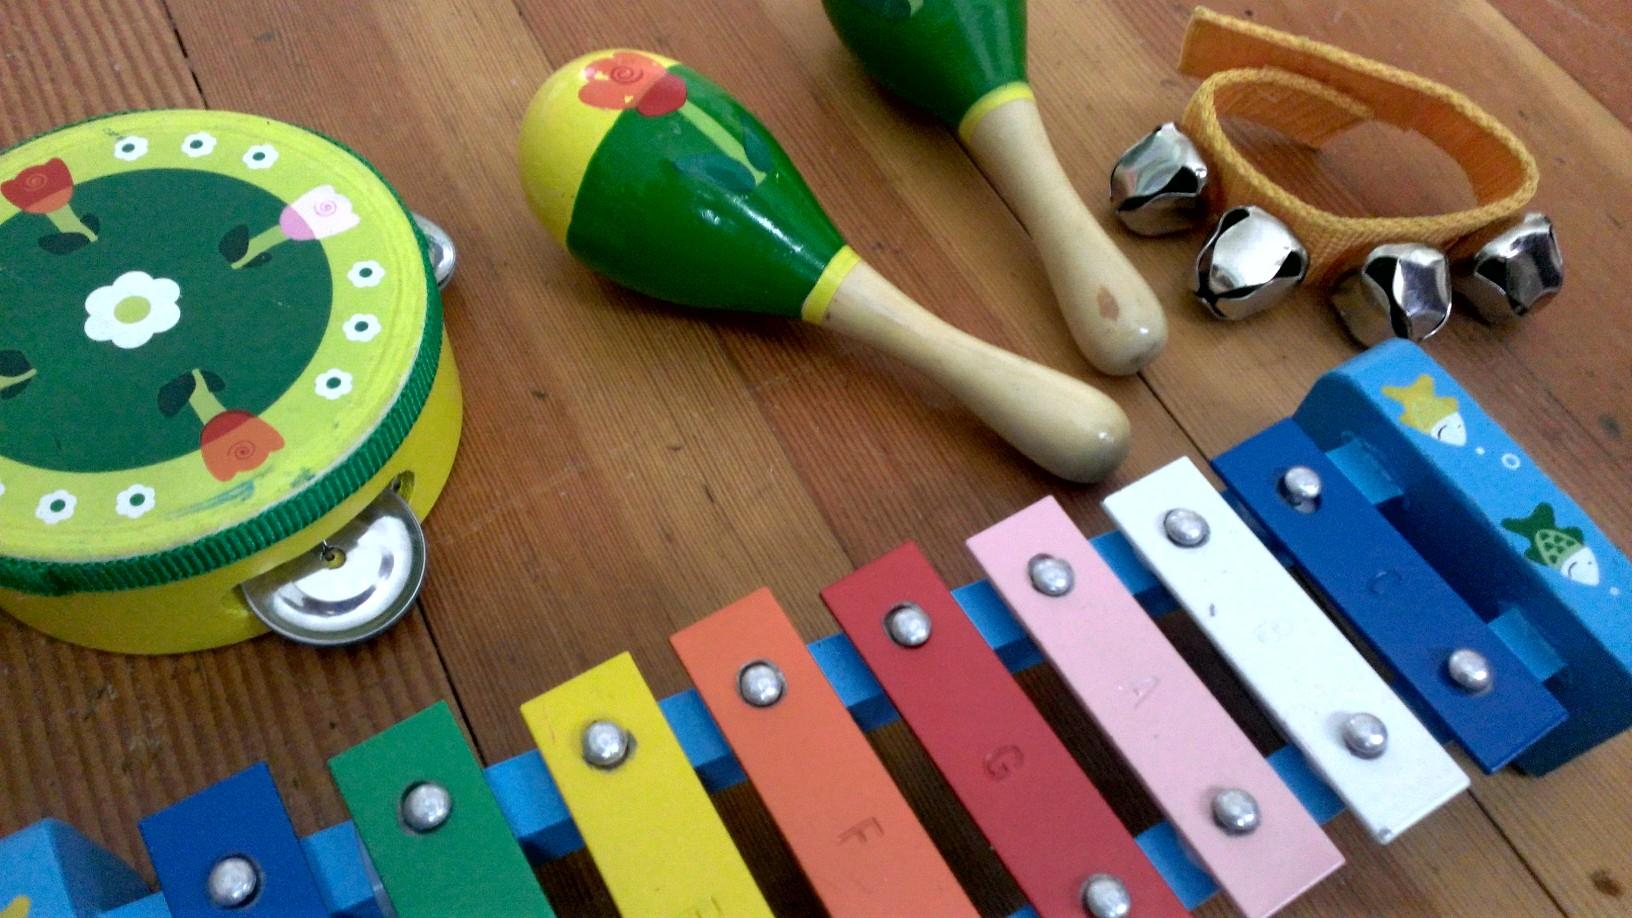 Musical Instruments.jpg